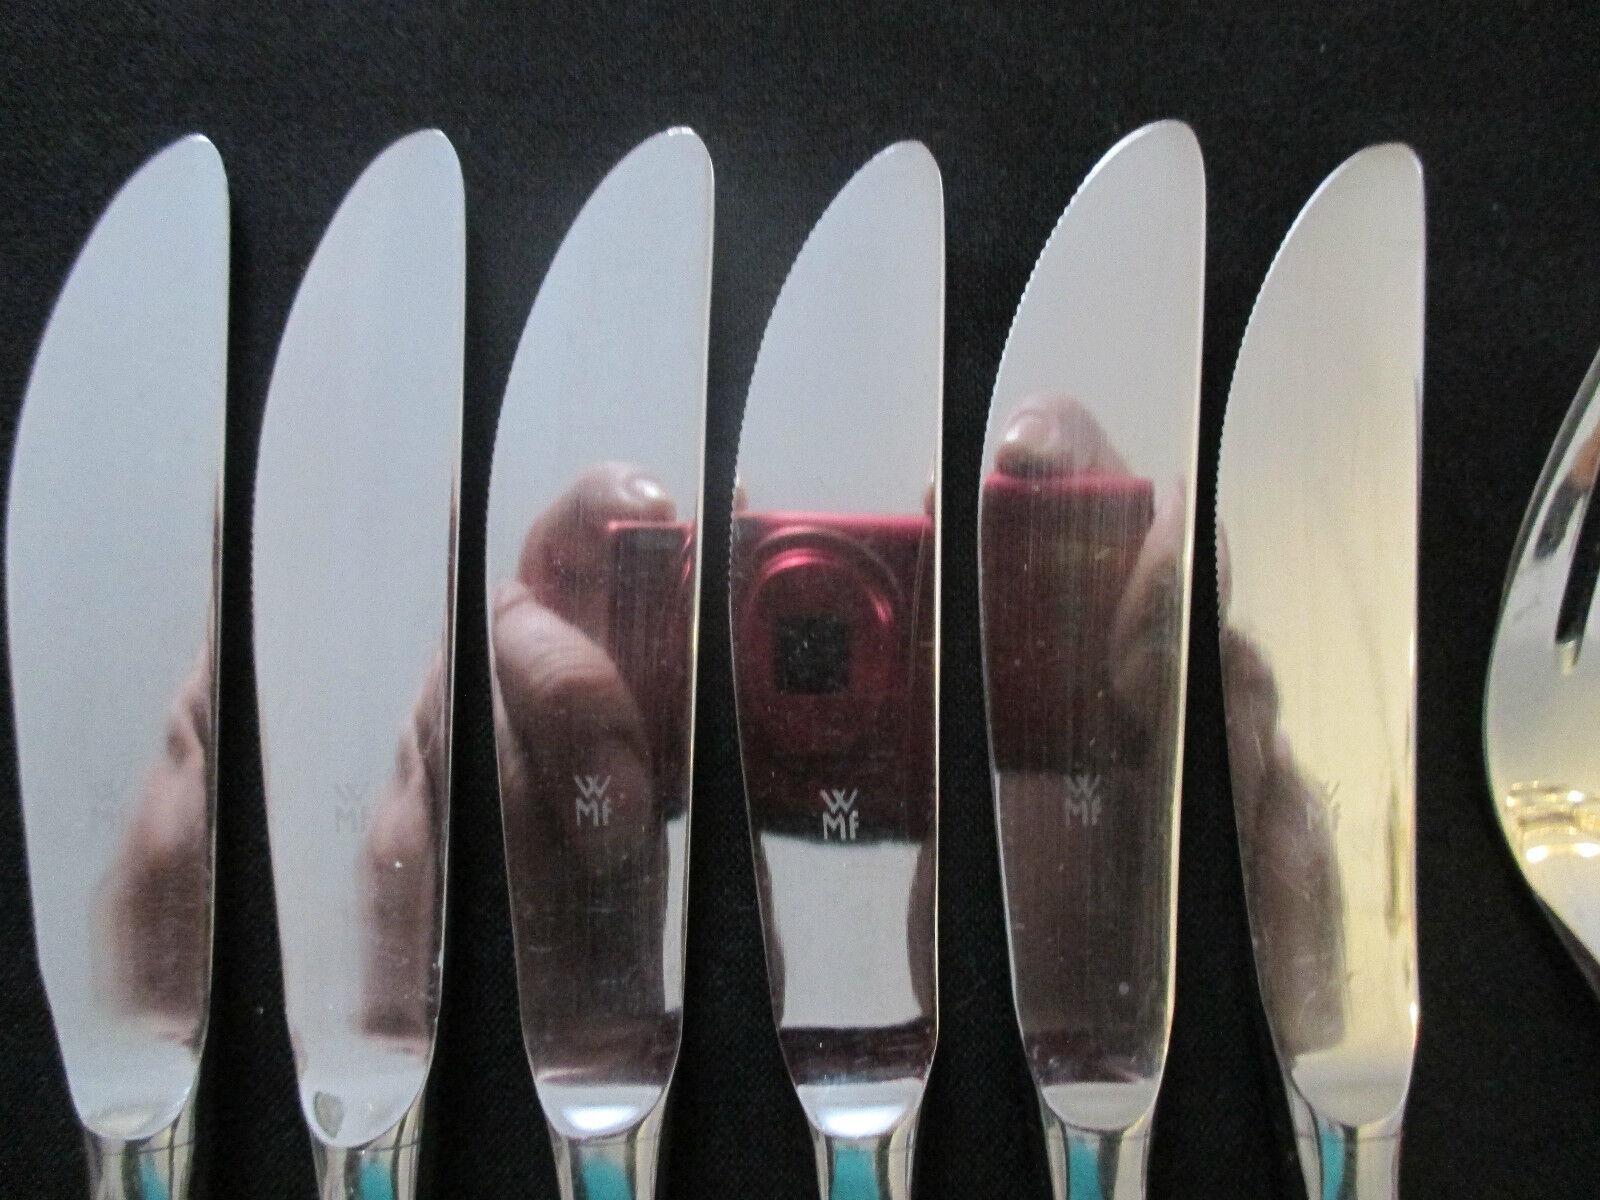 WMF Sevilla Cromargan 6 Menümesser 6 Personen 6 tlg Note 2-3 Tafelmesser Messer